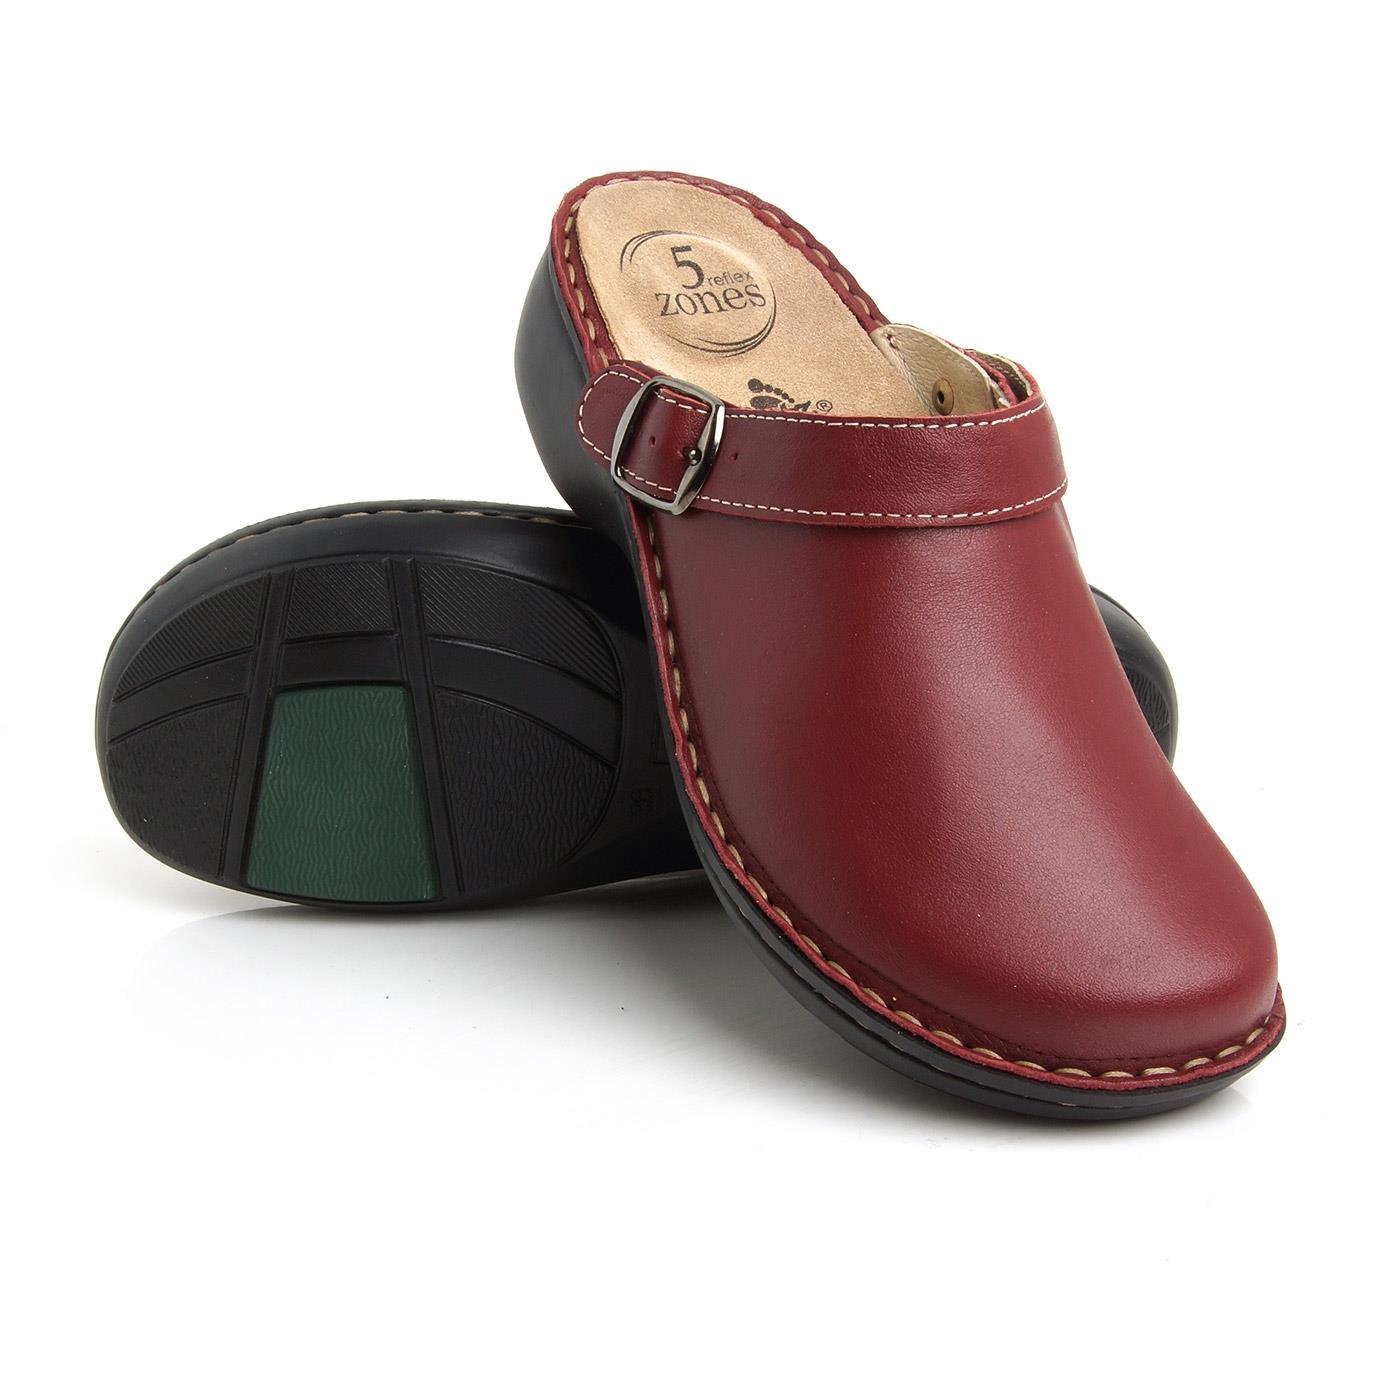 Batz dámské zdravotní pantofle Mira Dark red 37